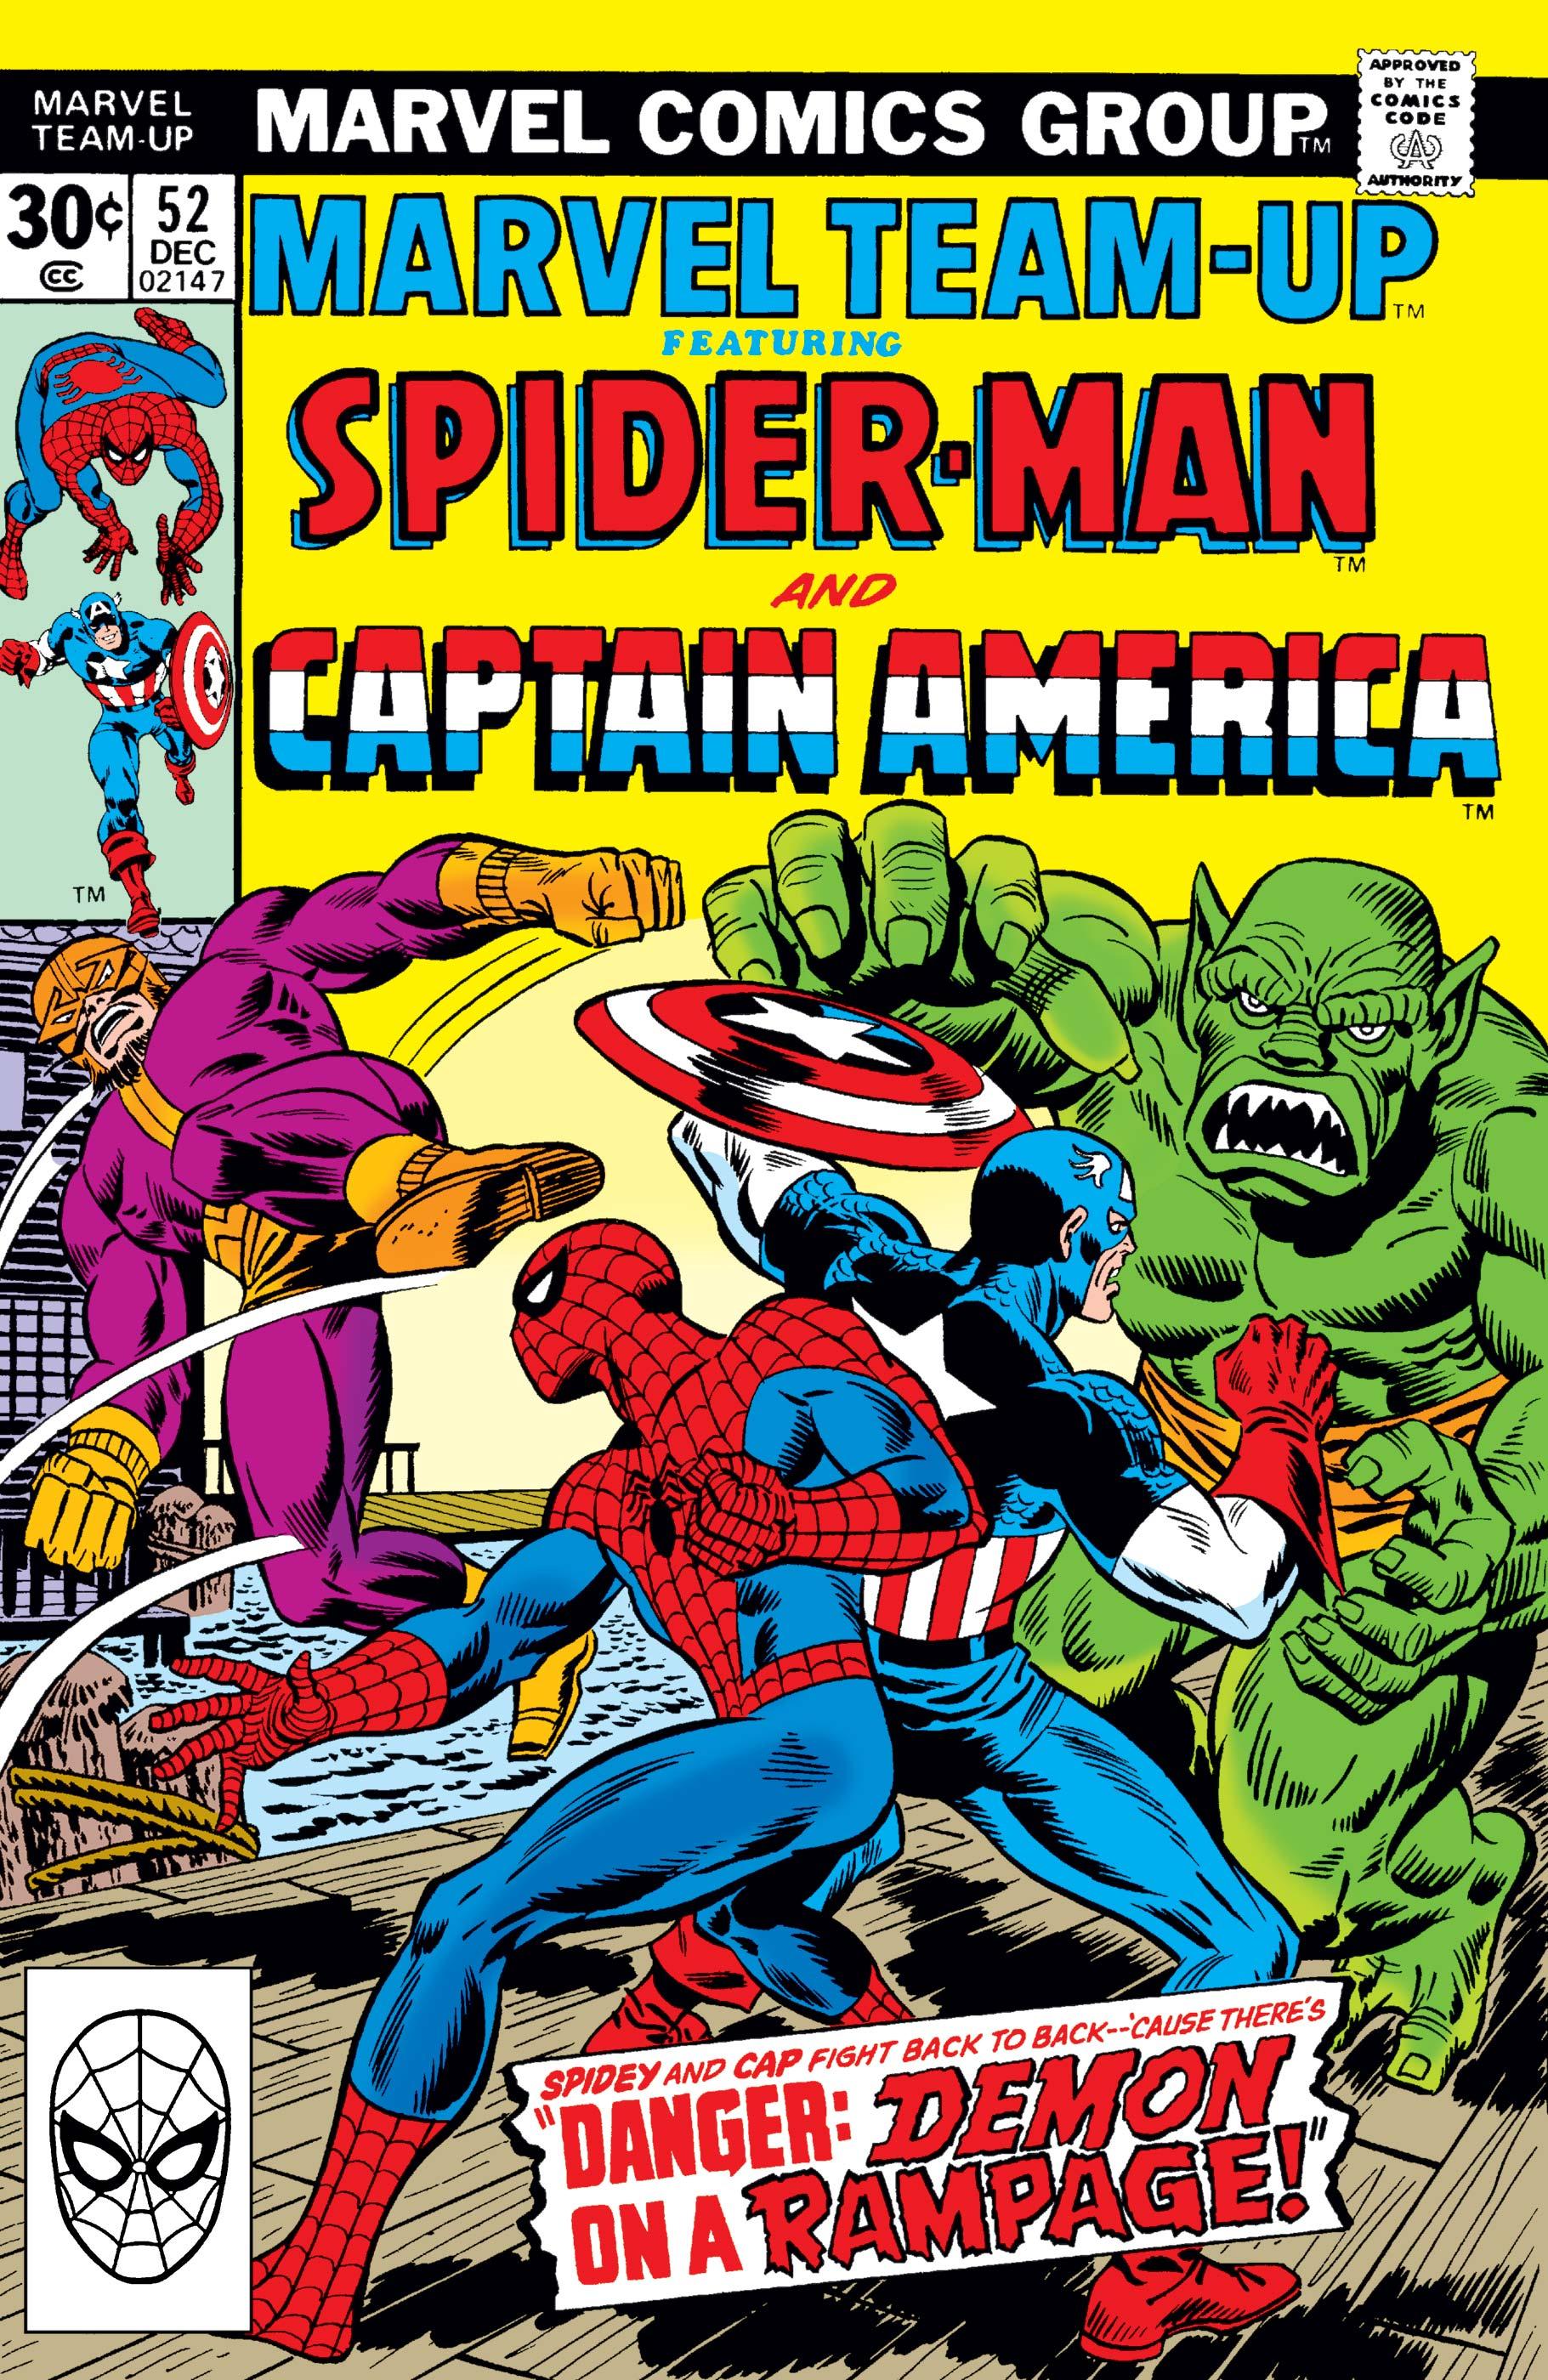 Marvel Team-Up (1972) #52